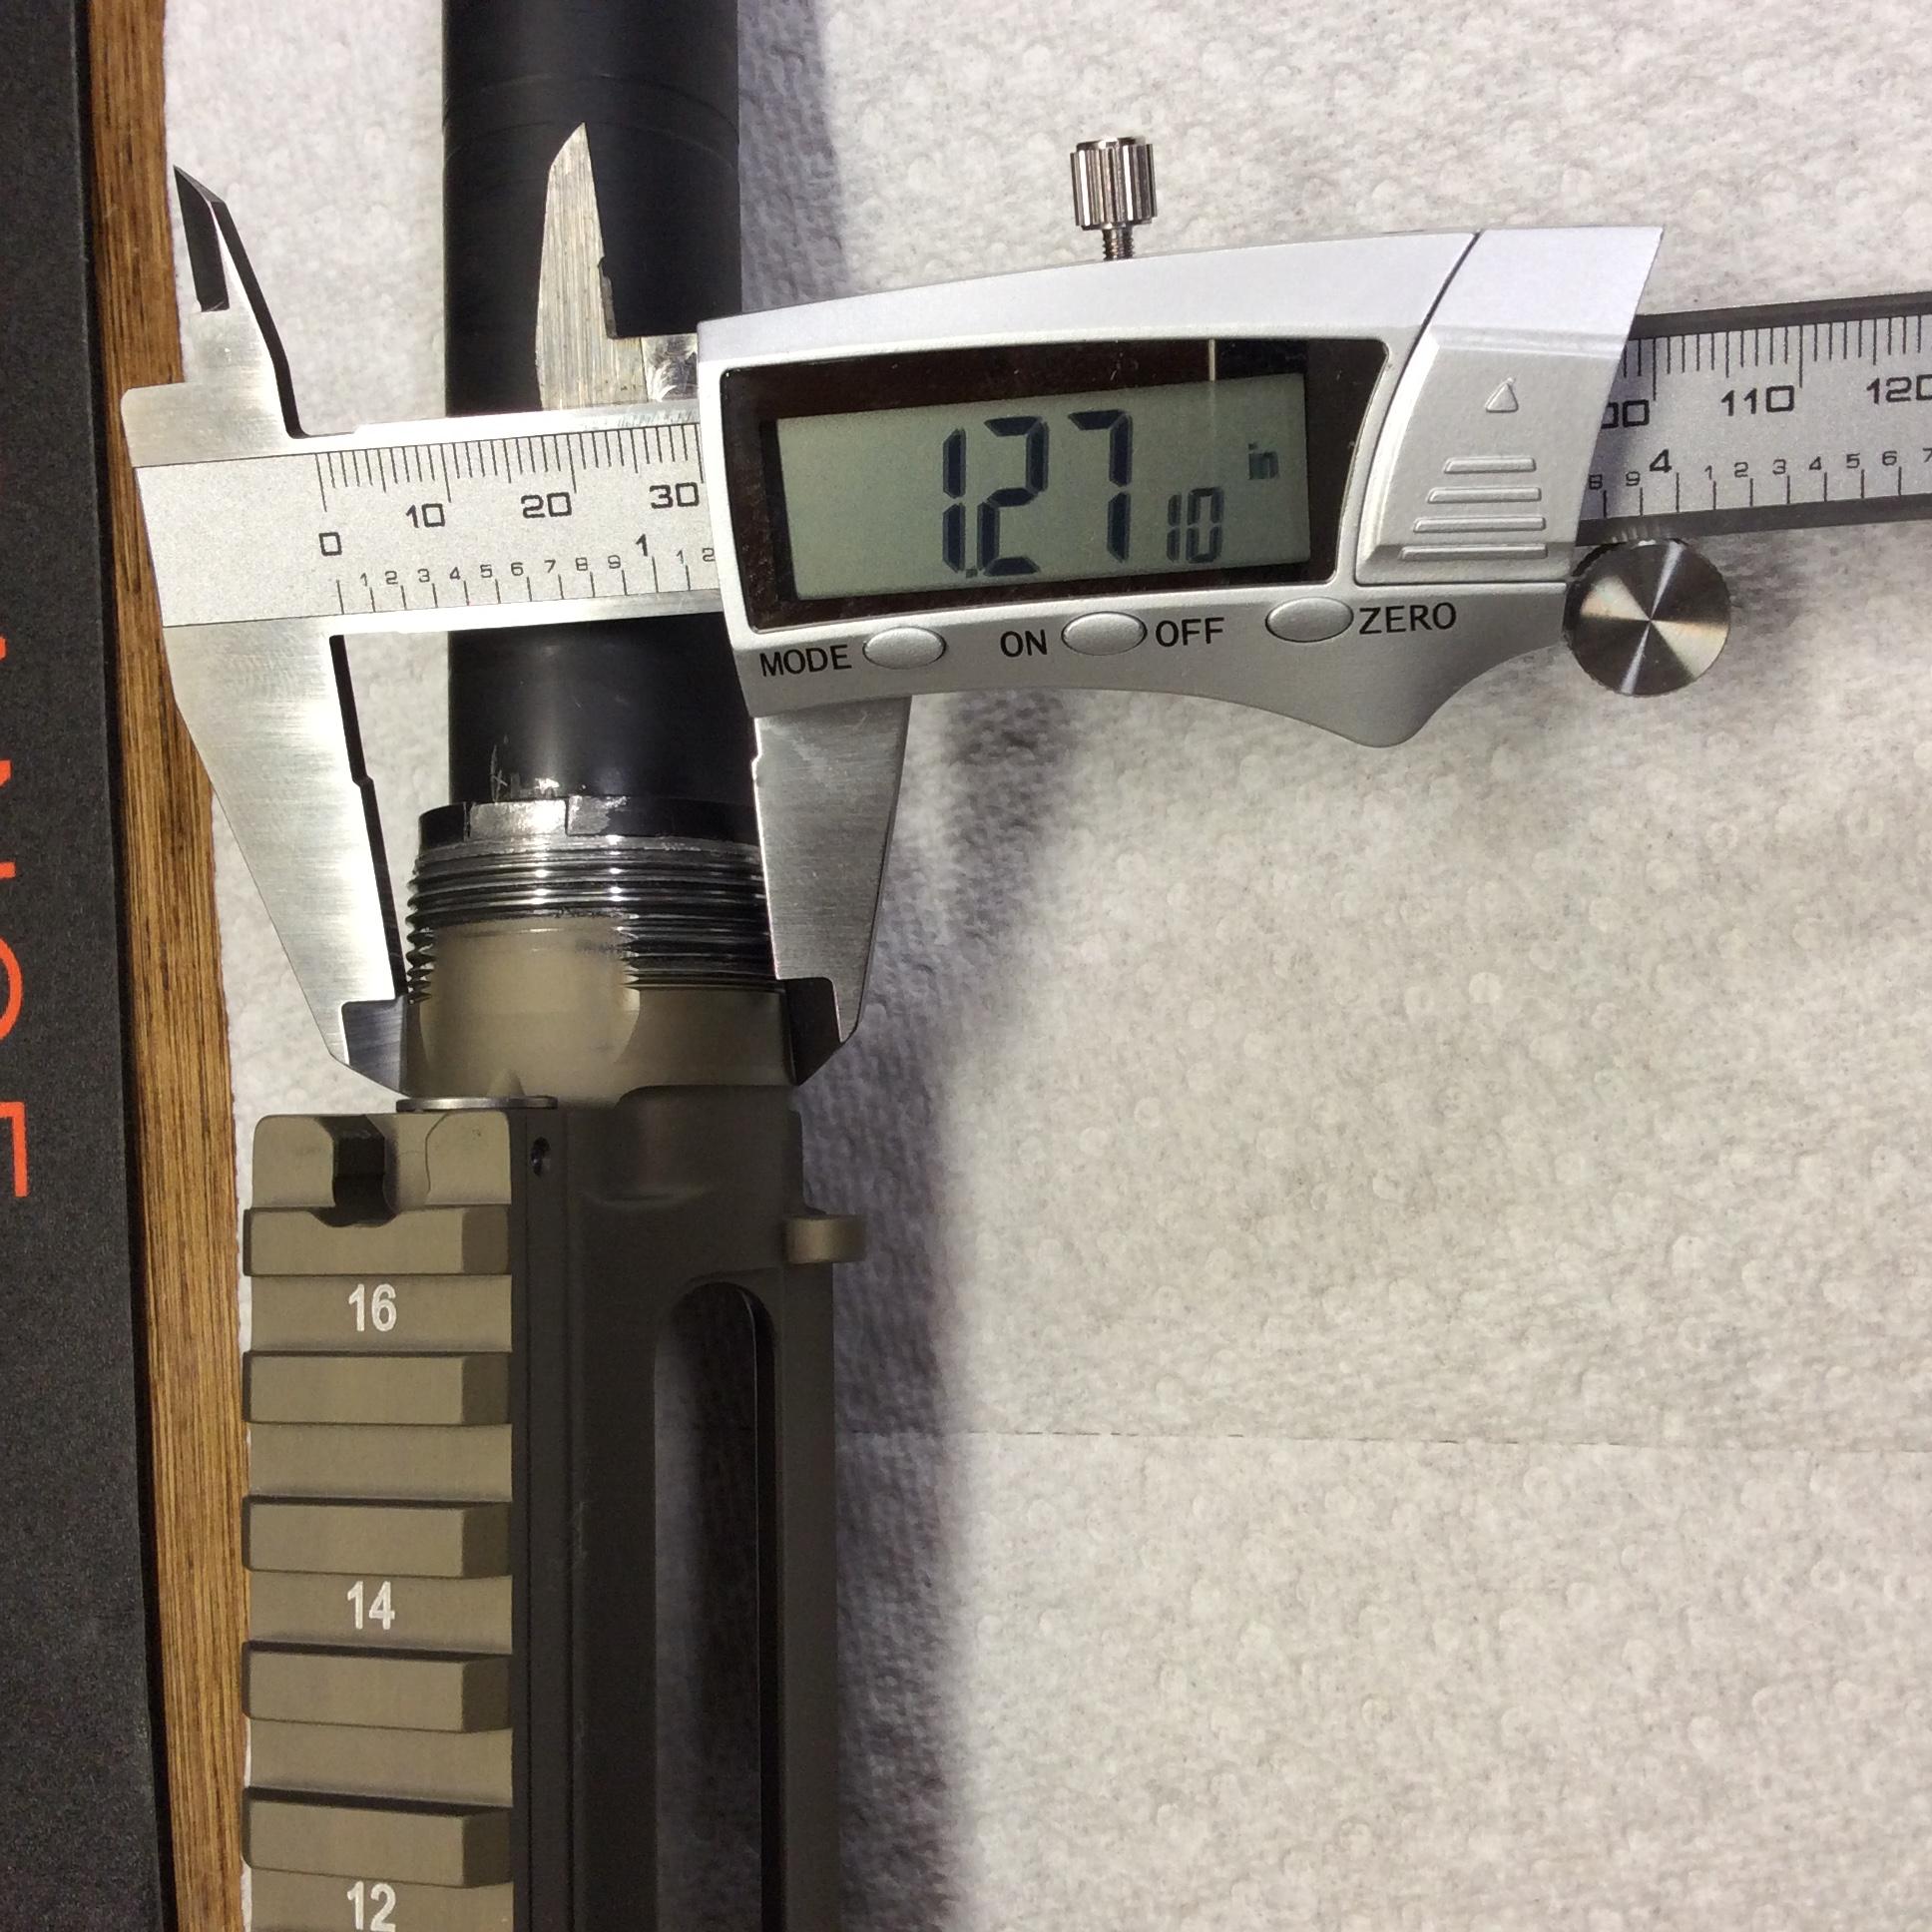 HK416A5 Upper to MR556 barrel-img_1817.jpg